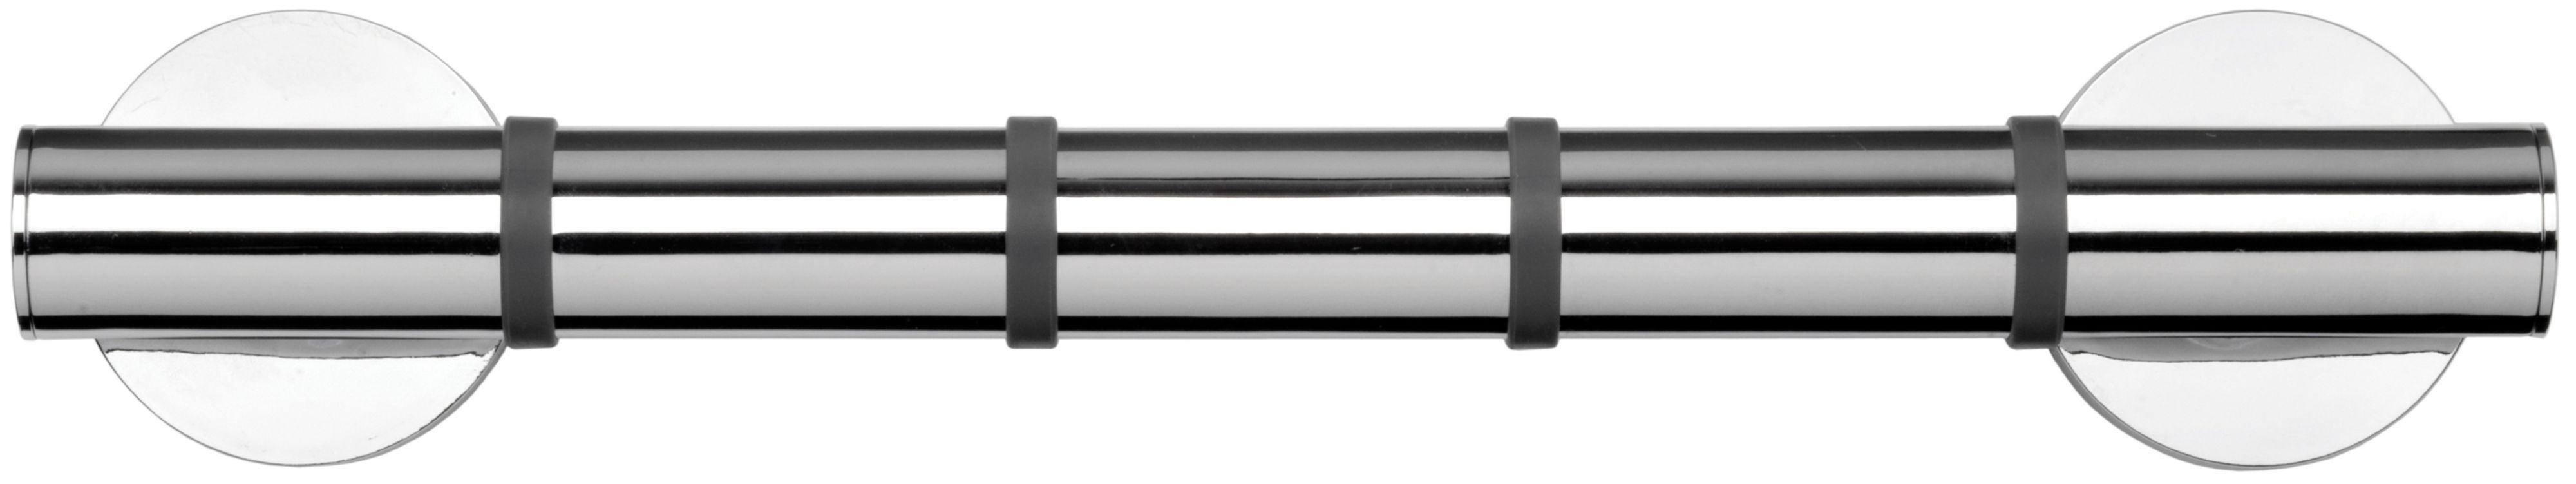 Croydex Grab'n'grip Chrome Straight Grab Bar (l)380mm